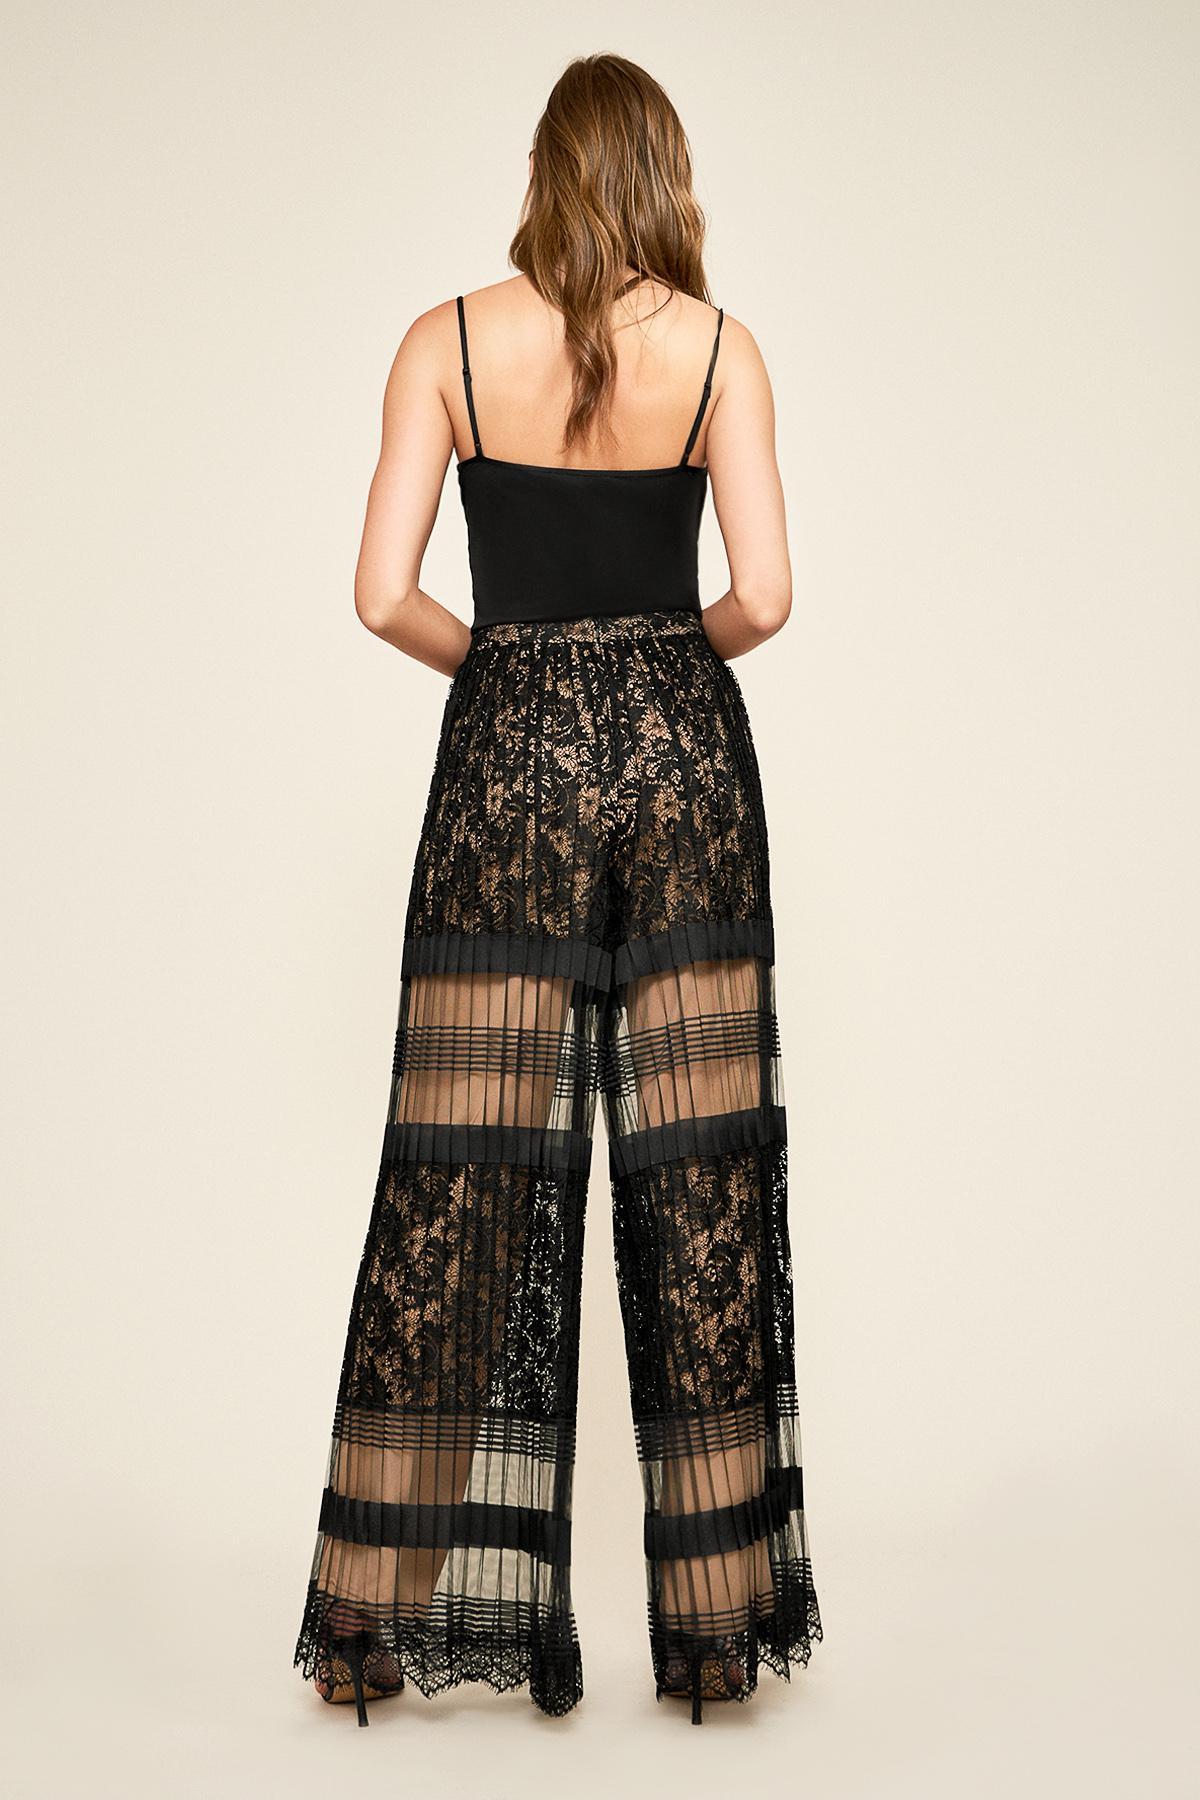 0d3ac5a76cd Tadashi Shoji - Black Dover Pleated Lace Pant - Lyst. View fullscreen